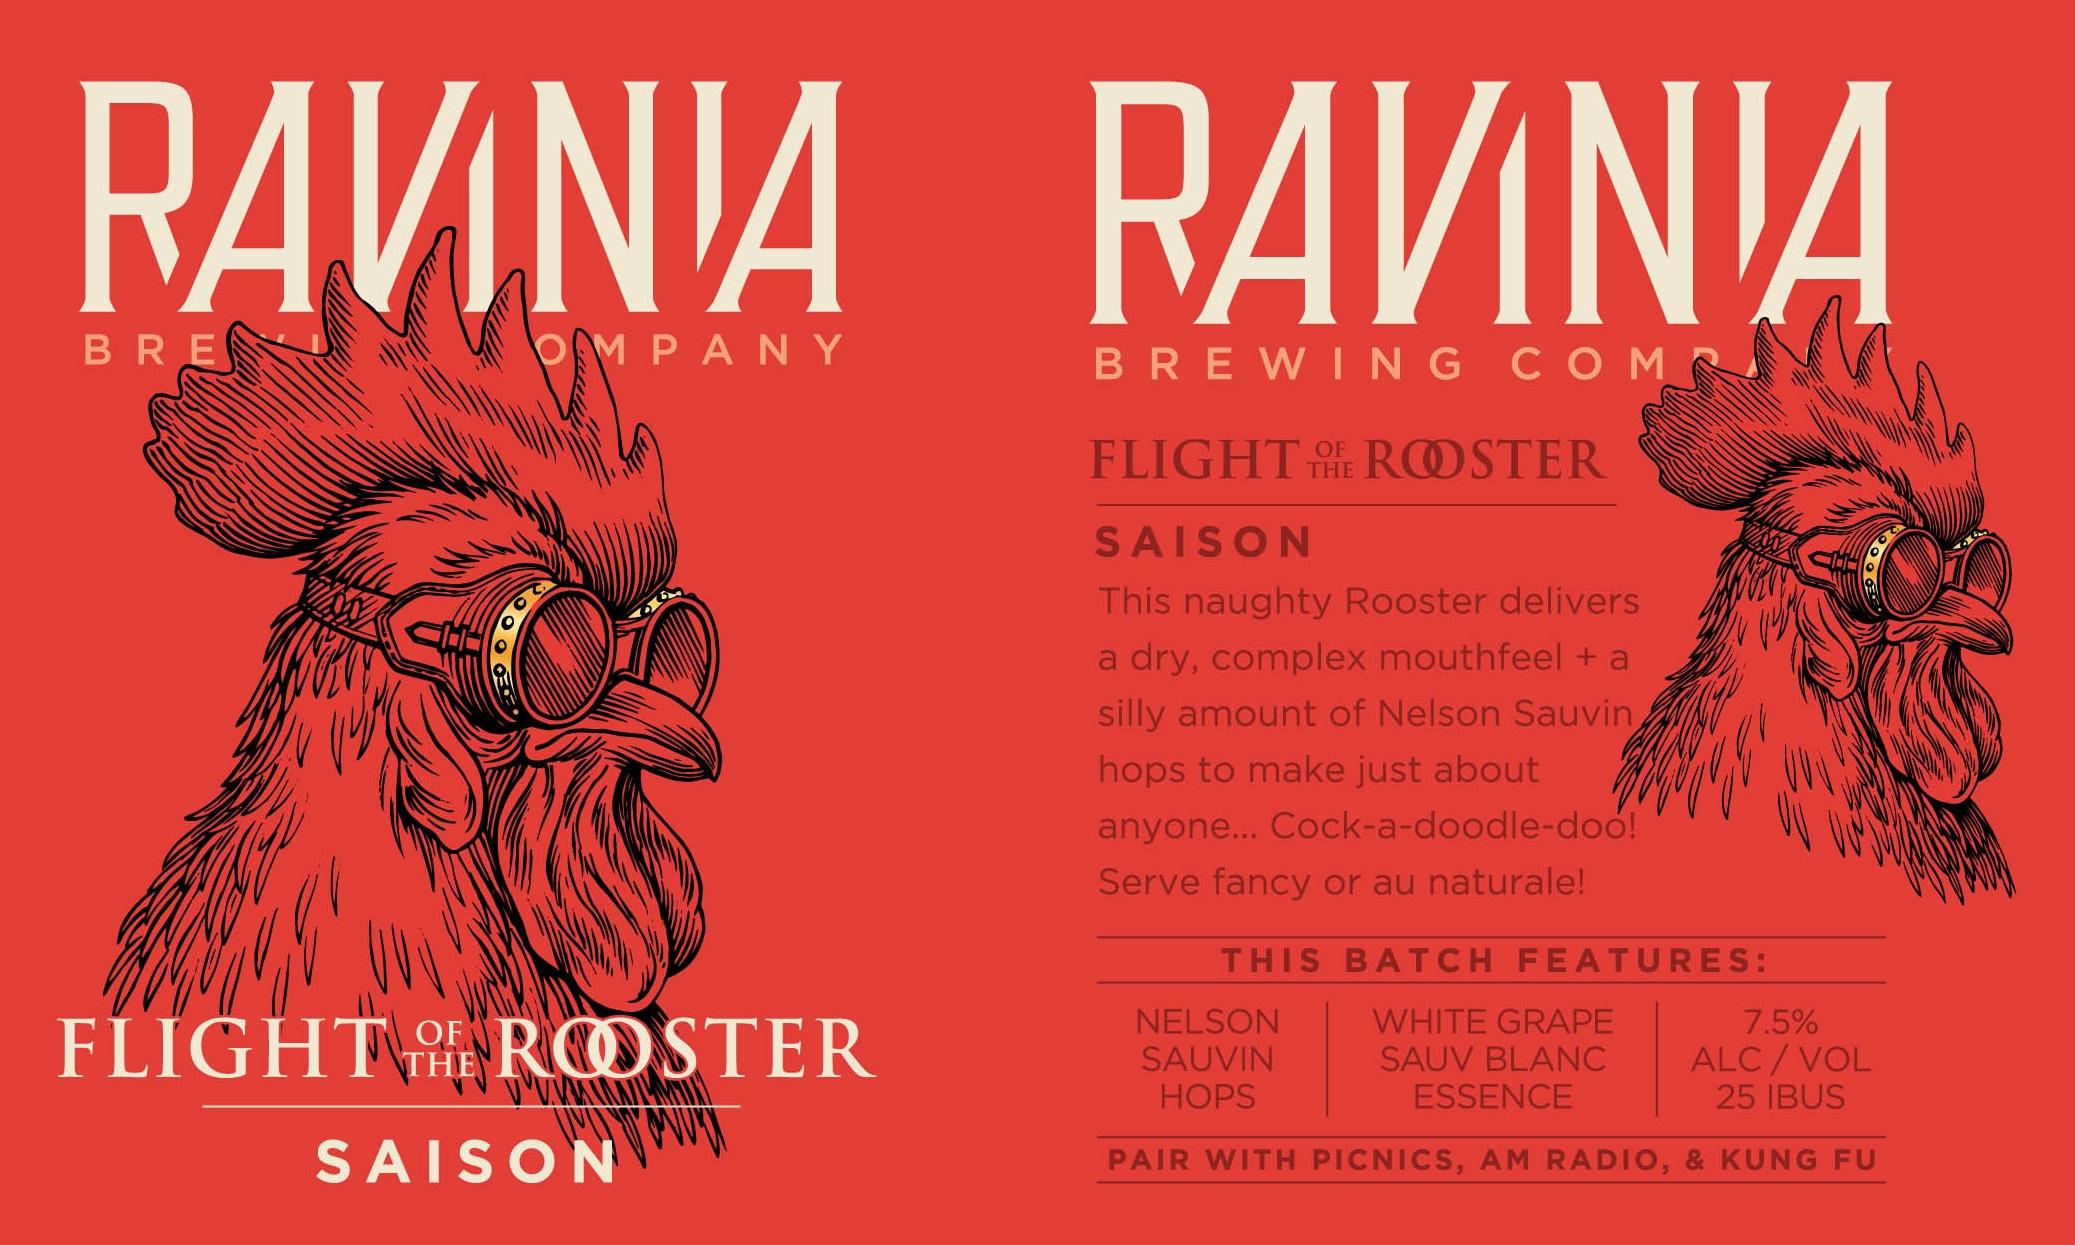 Ravinia Brewing_Poster_Flight Rooster Saison.jpg